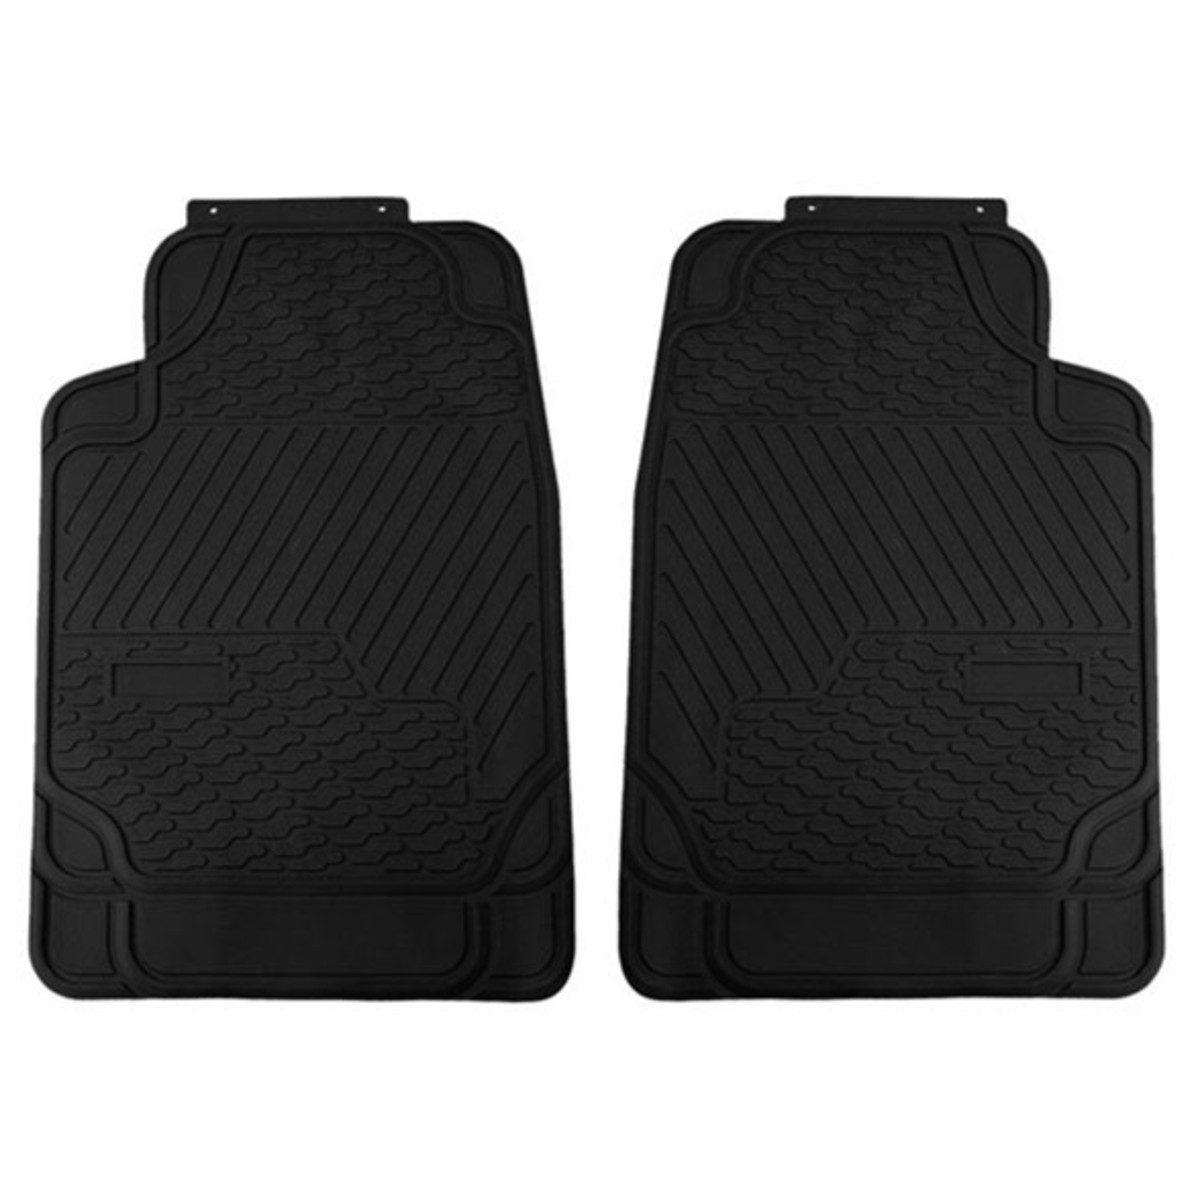 66-F11309-FRONT_black floormat 2